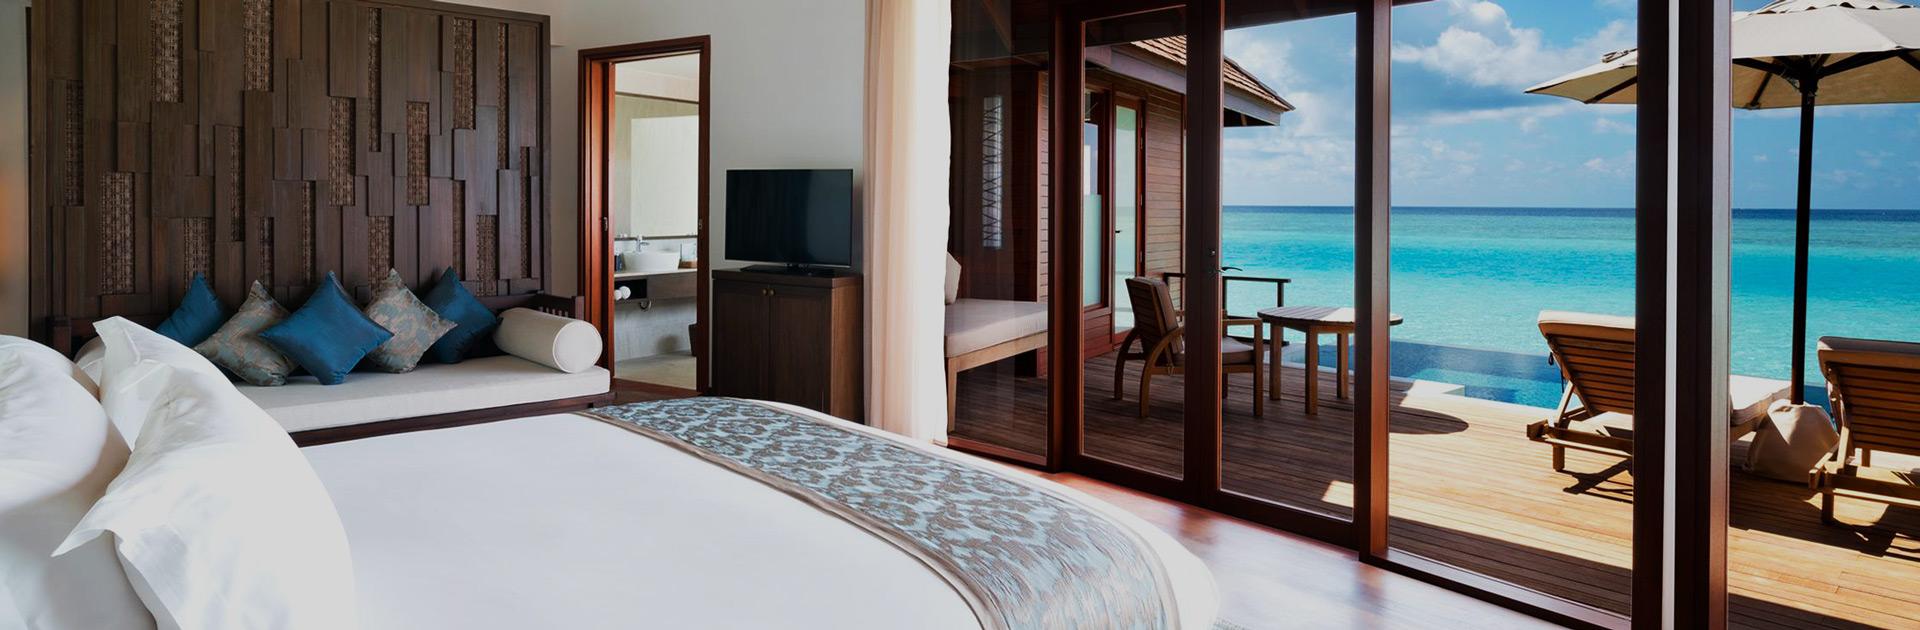 MV Anantara Dhigu Resort and Spa 9 días 4